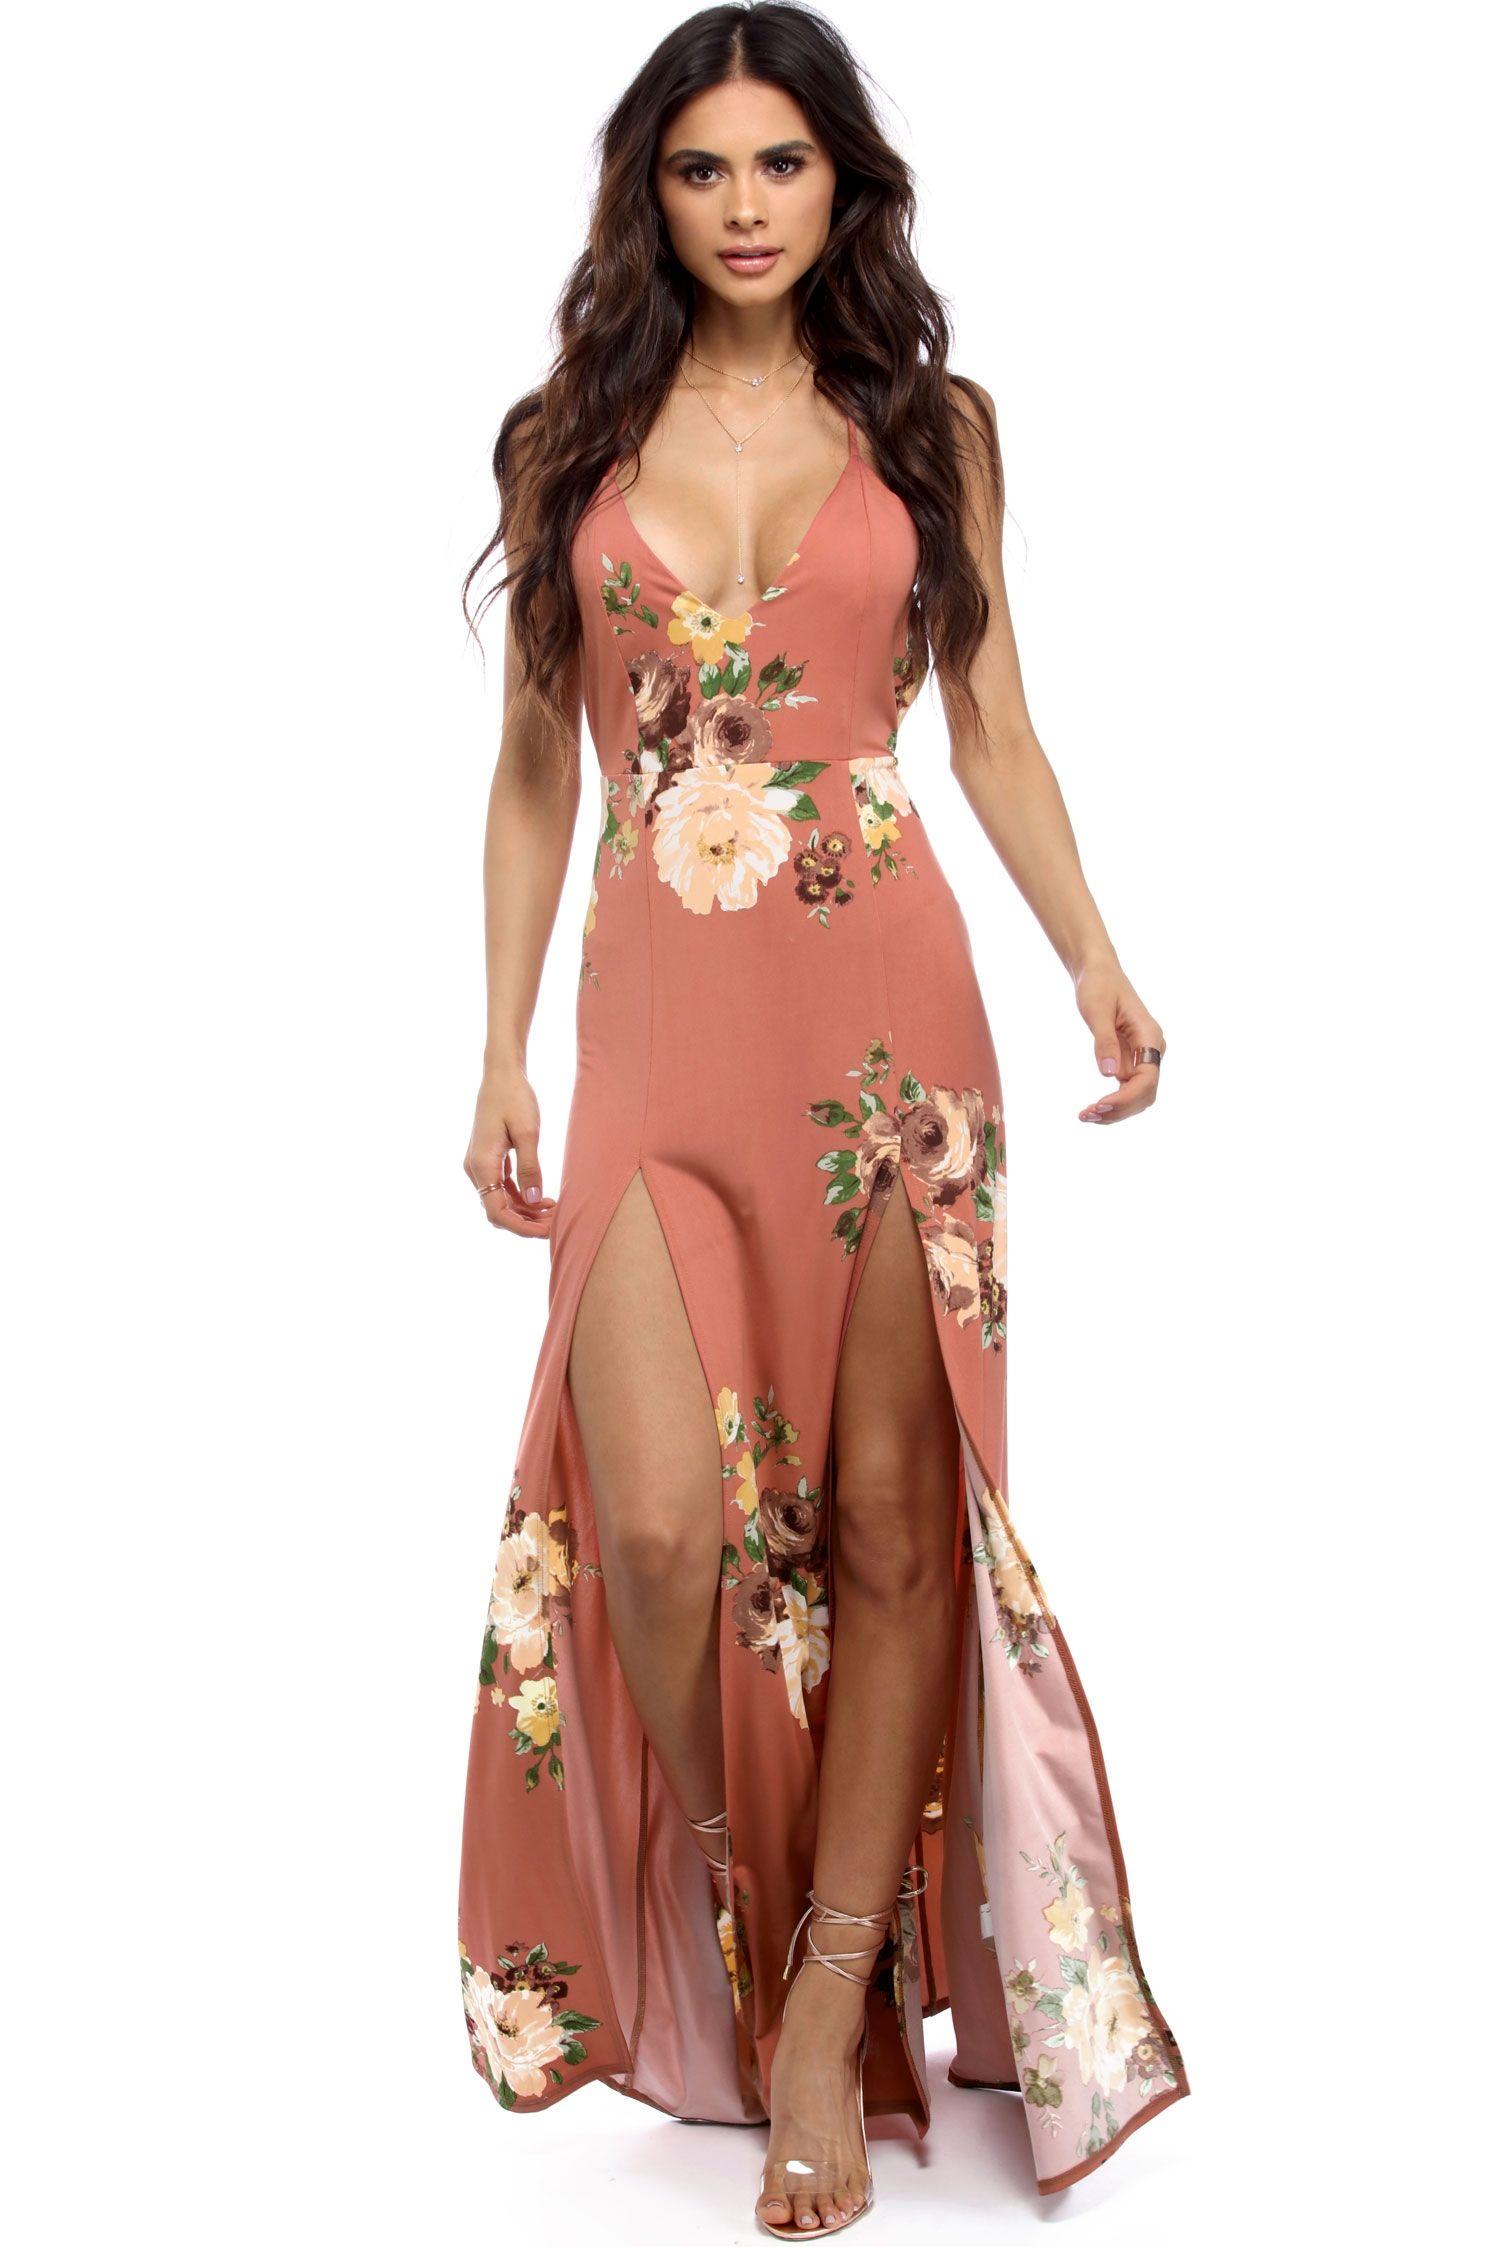 FINAL SALE- Rust Floral Slit Maxi Dress | Maxi dresses, Floral and ...